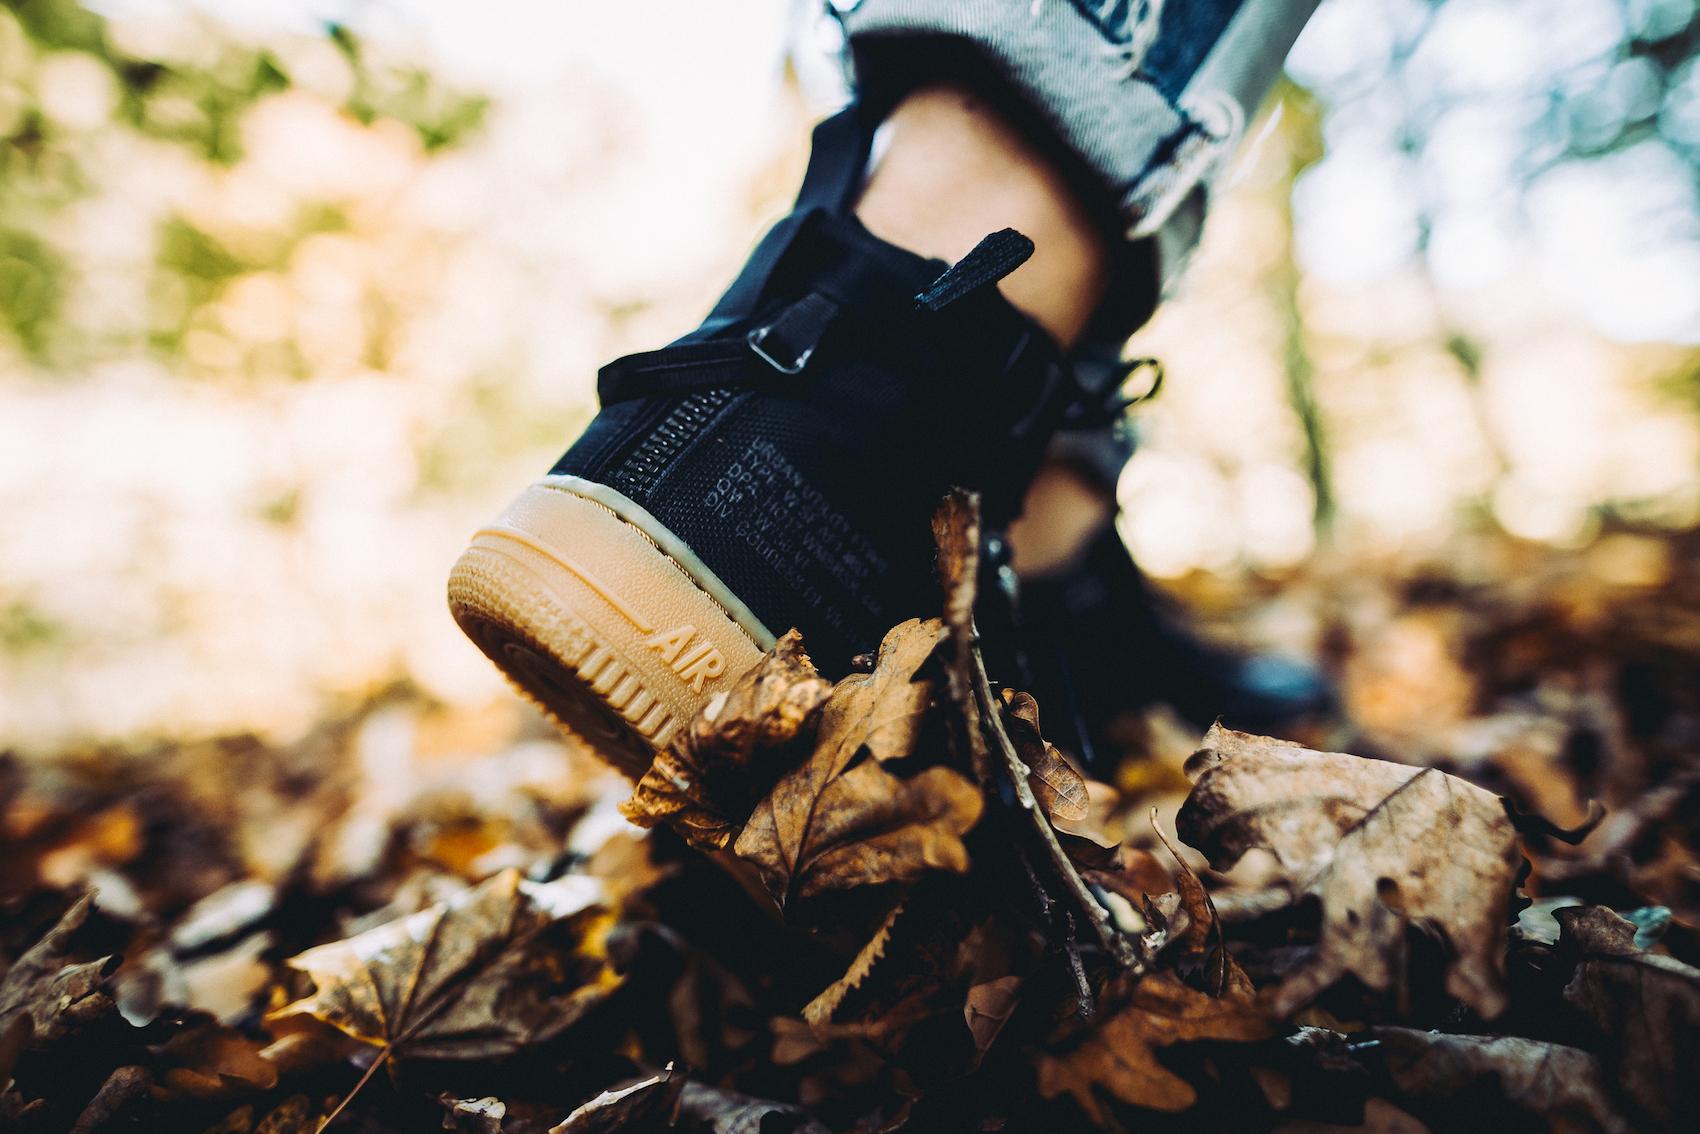 Sneakerboots a zimní tenisky | ❄️ 🌧